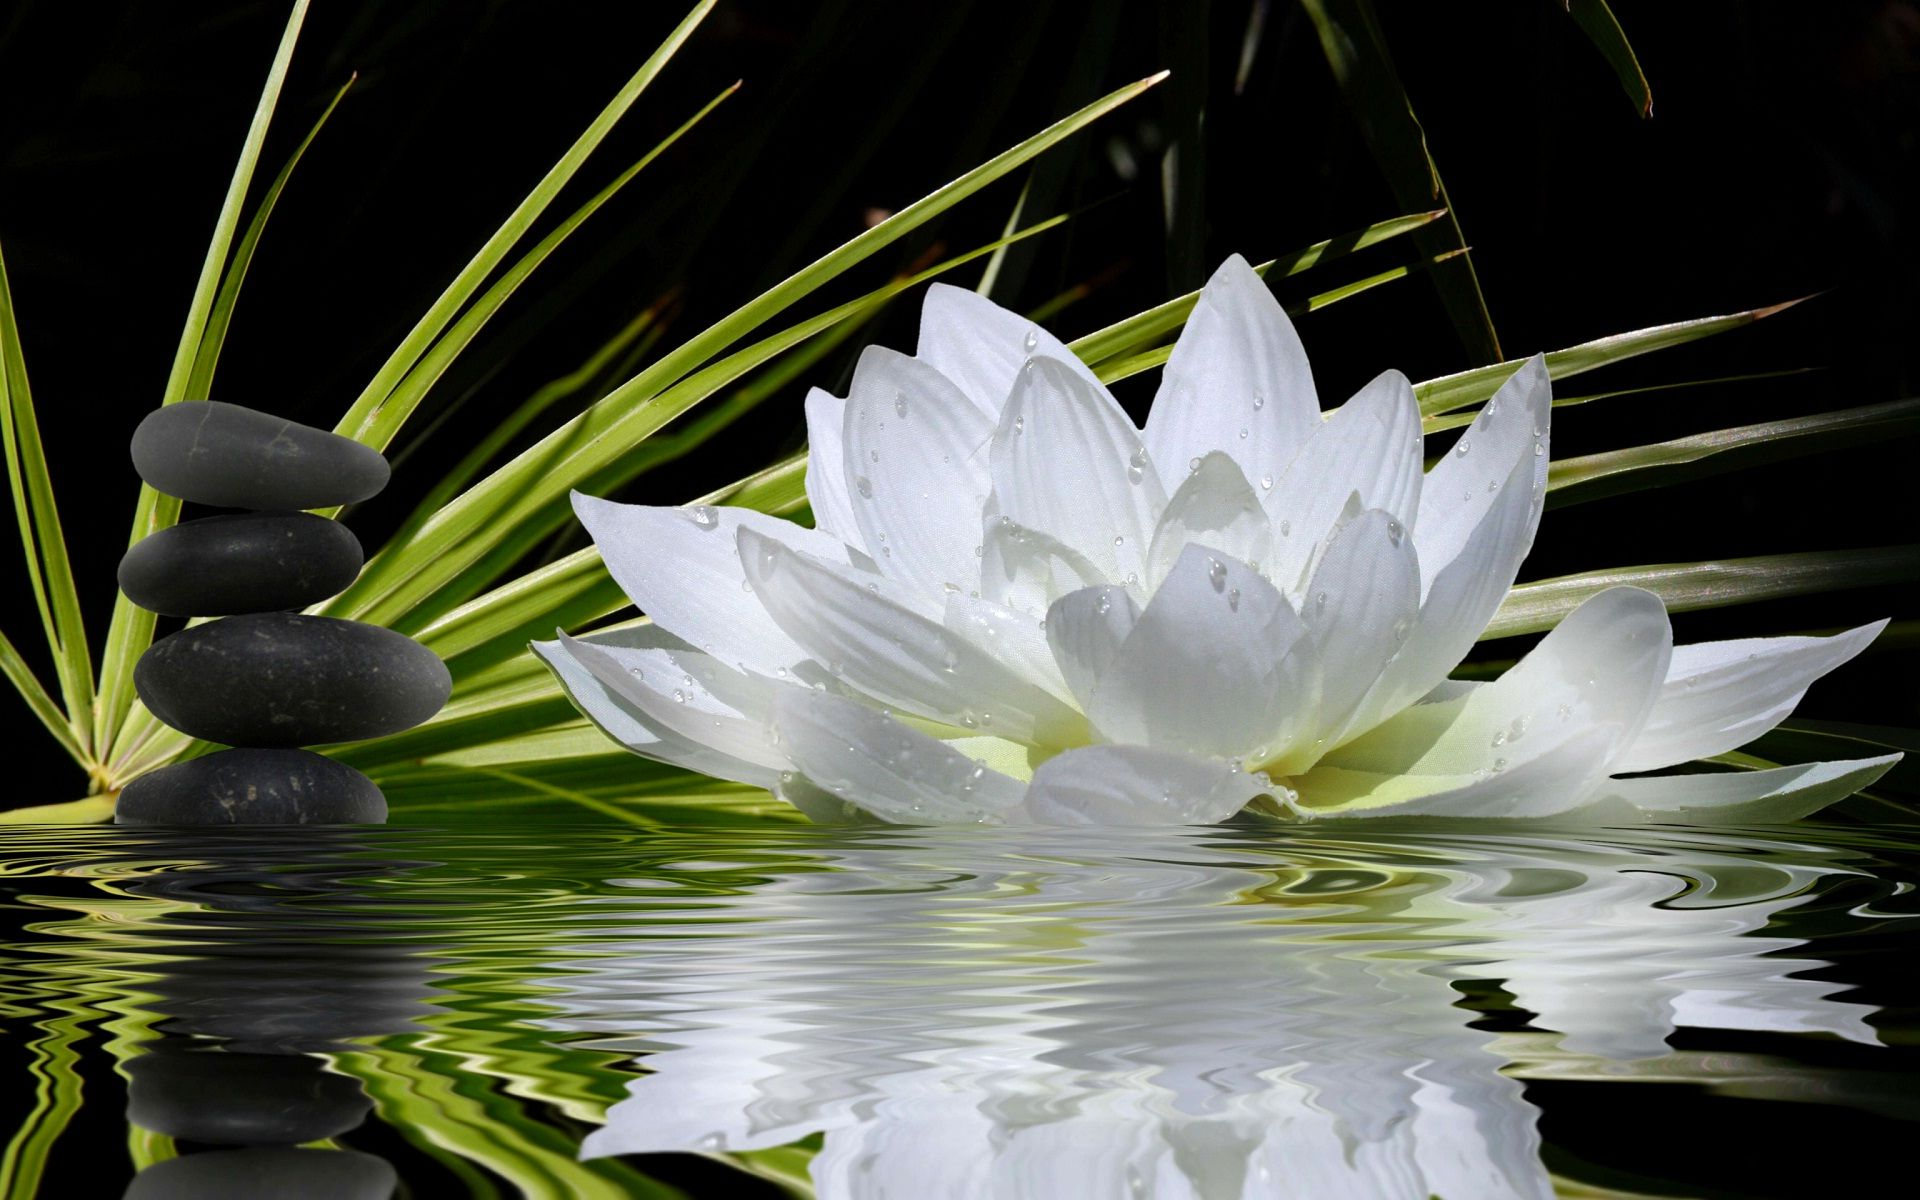 Hình nền hoa sen trắng